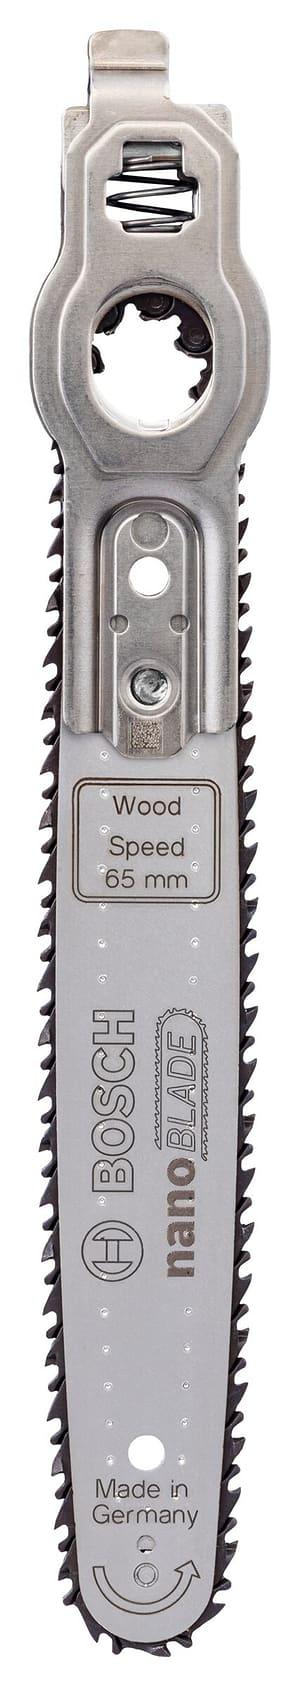 NanoBlade Wood Speed 65